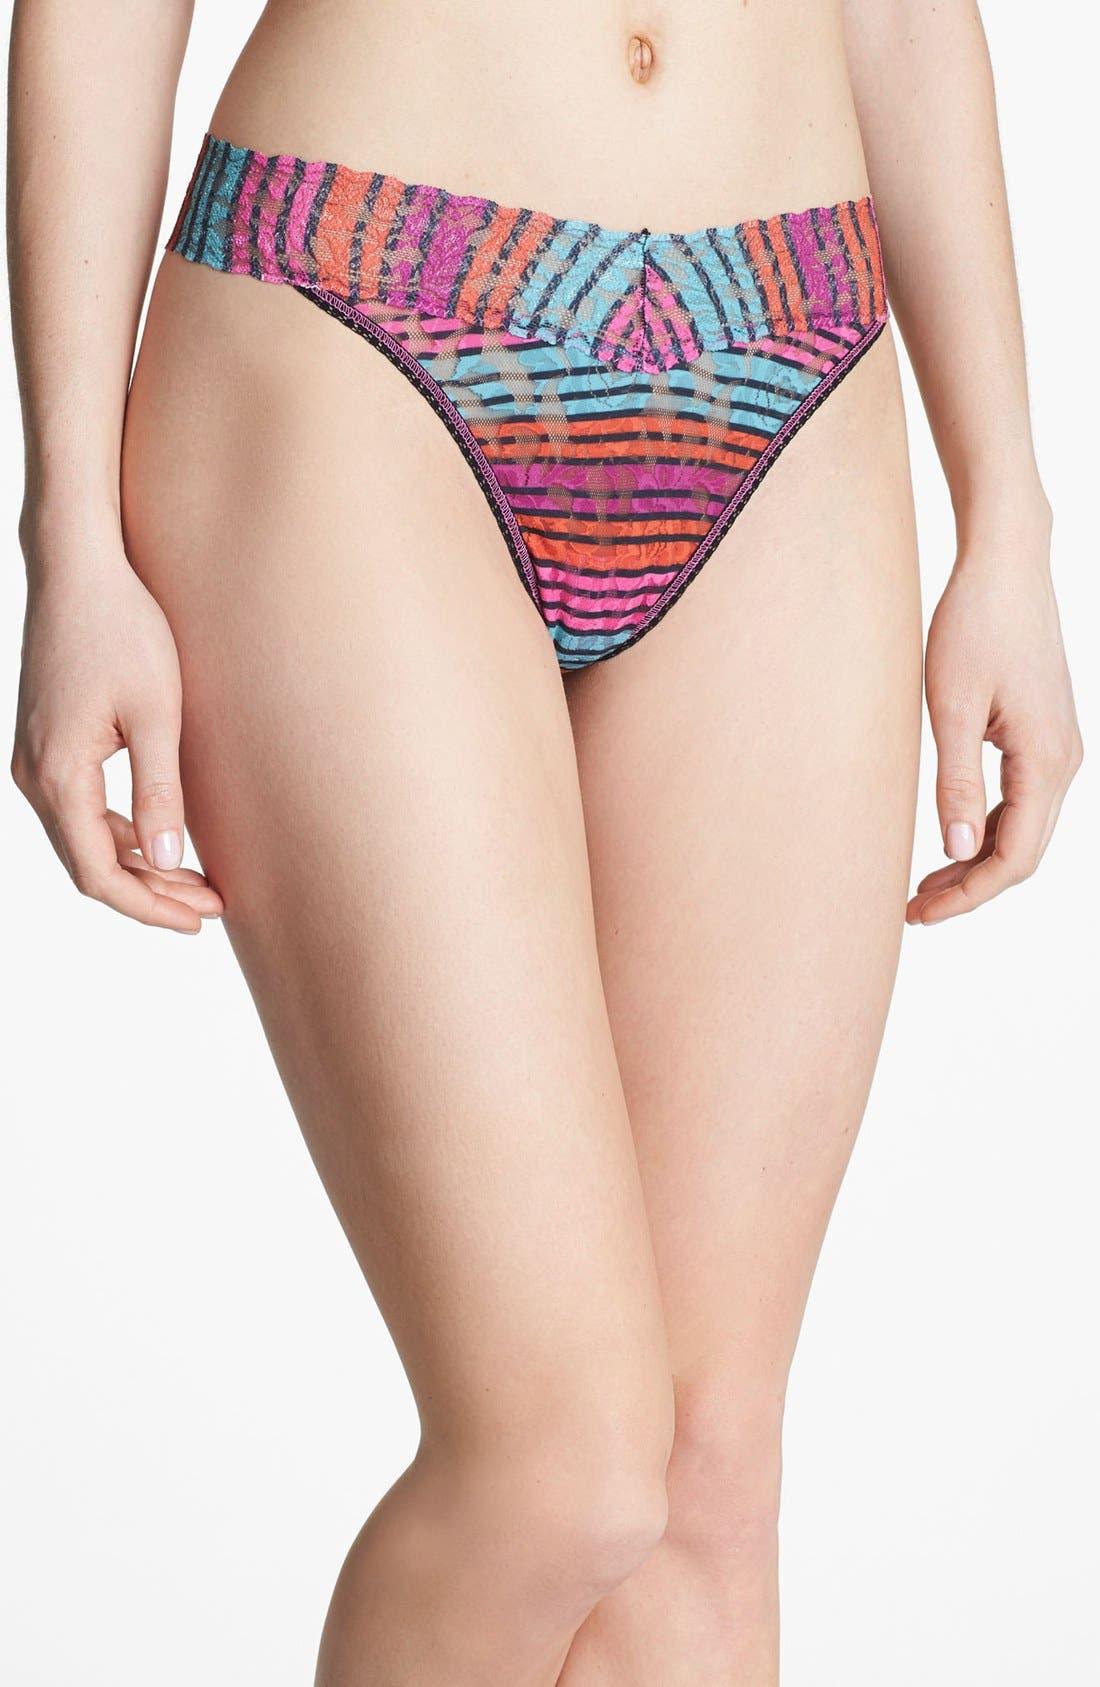 Main Image - Hanky Panky 'Licorice Stripe' Regular Rise Thong test IMT hello